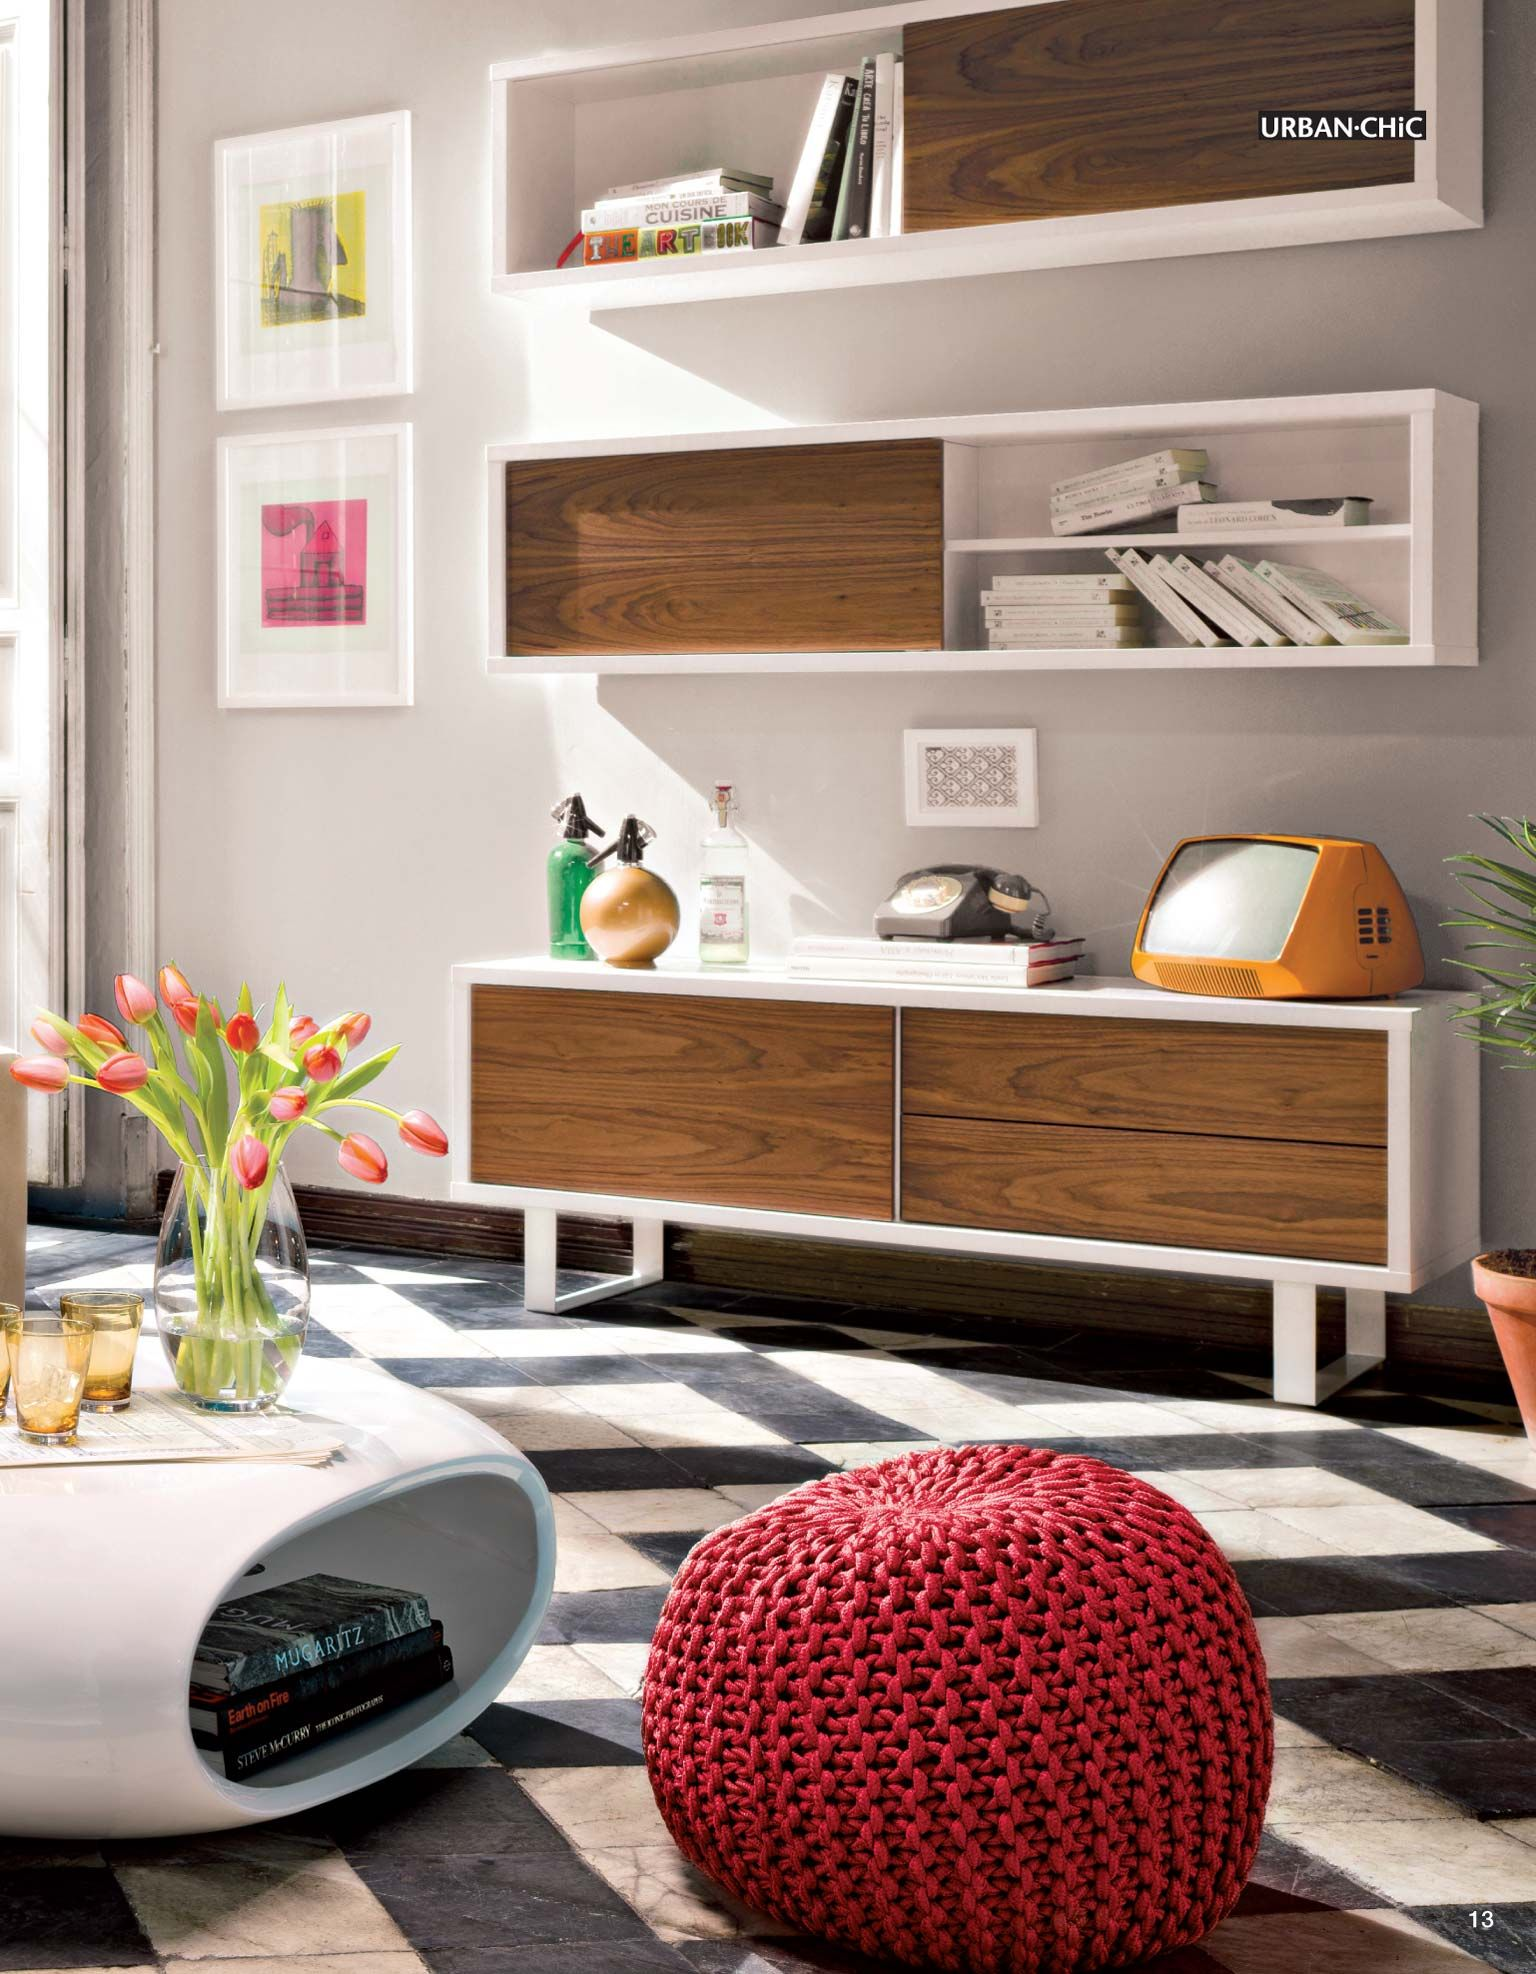 Mueble de tv urban chic nilo dormitorios pinterest salons living rooms and room - Muebles urban chic ...